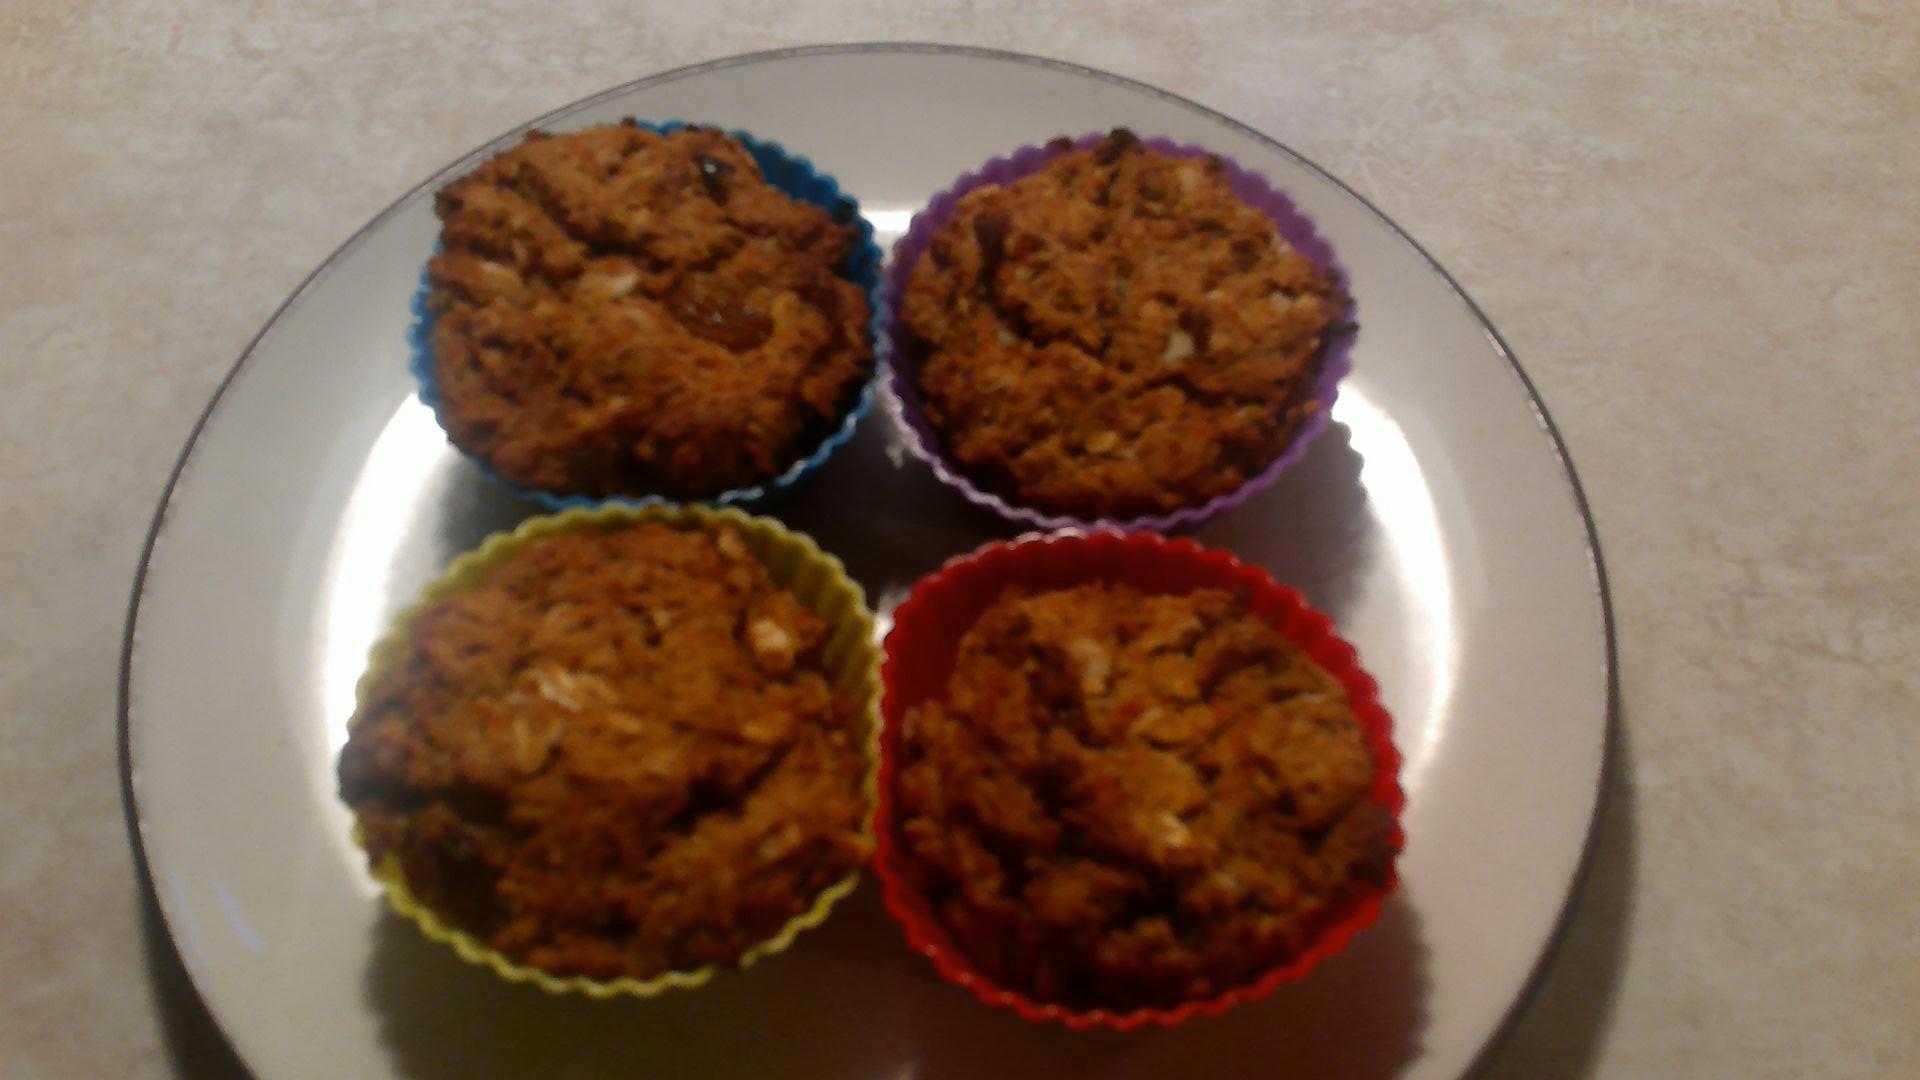 Carrot Morning Glory Muffins (Gluten Free Optional) sunshine